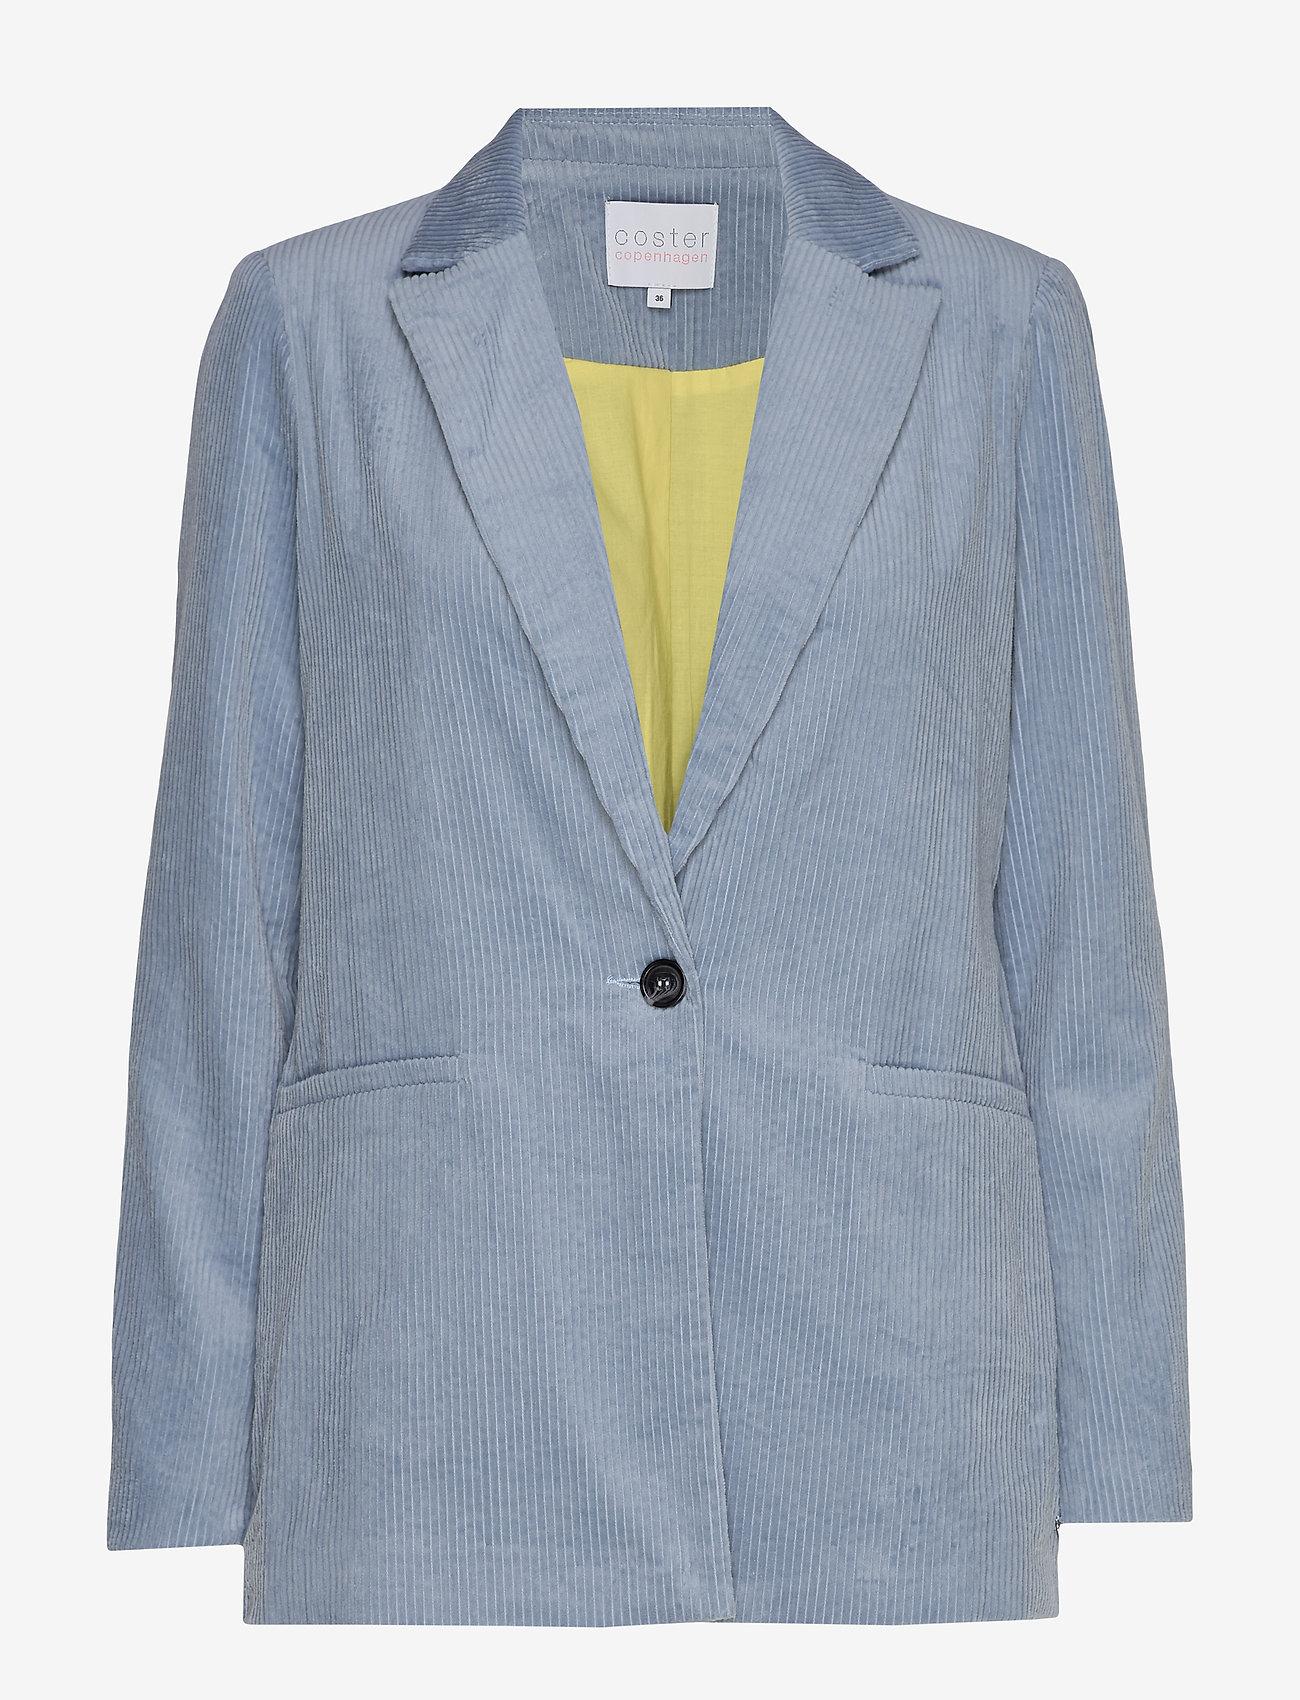 Coster Copenhagen - Suit jacket in corduroy - vestes tailleur - shadow blue